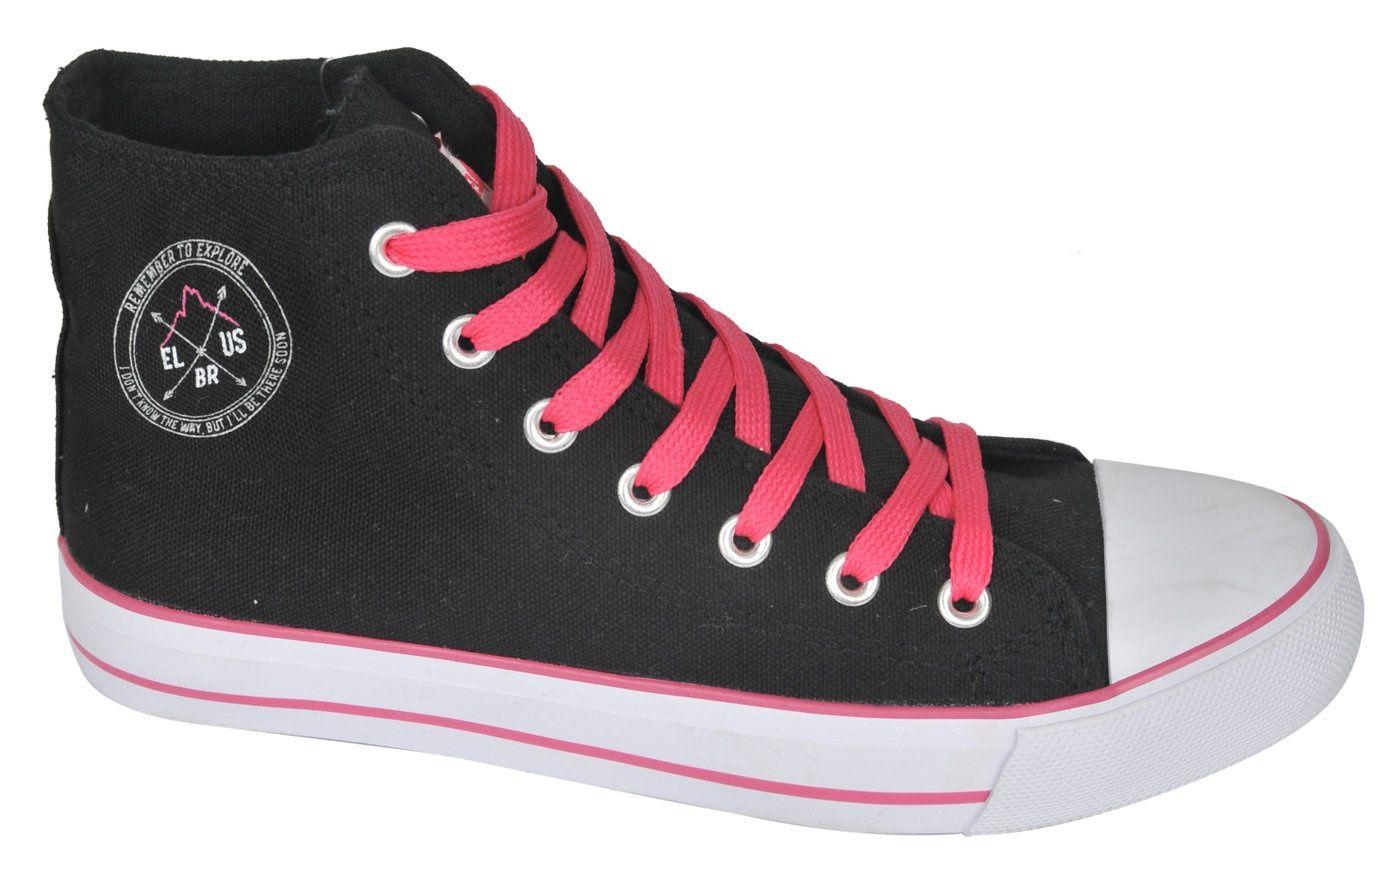 Buty Damskie Benido Elbrus Internetowy Sklep Sportowy Martes Sport High Top Sneakers Converse Chuck Taylor High Top Sneaker Chuck Taylors High Top